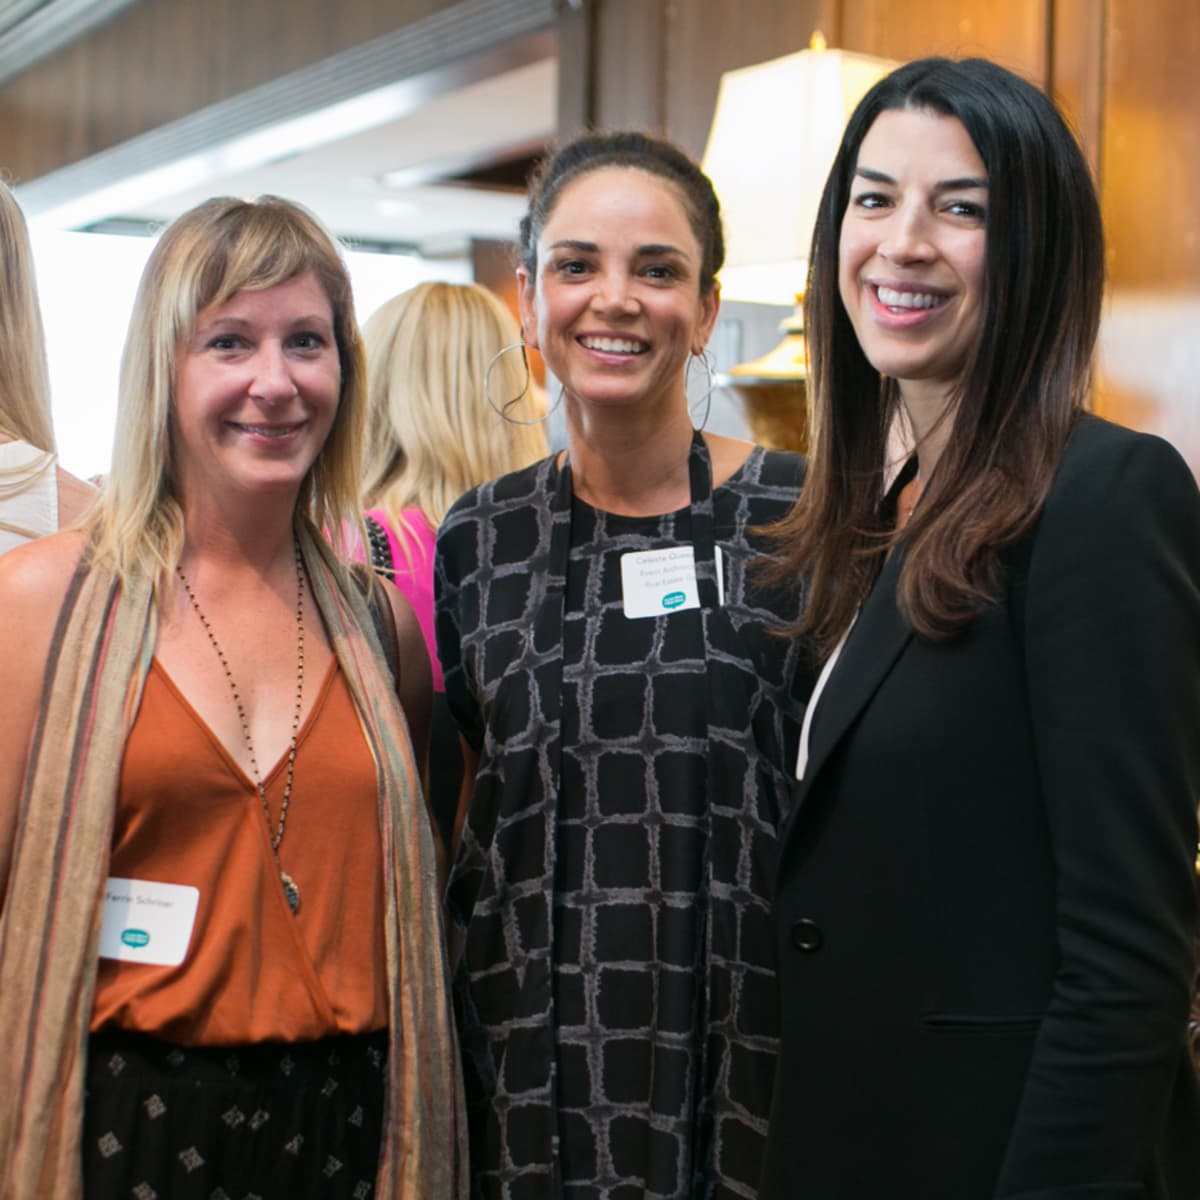 Ferrin Schriner, Celeste Quesada, and Marisa Secco